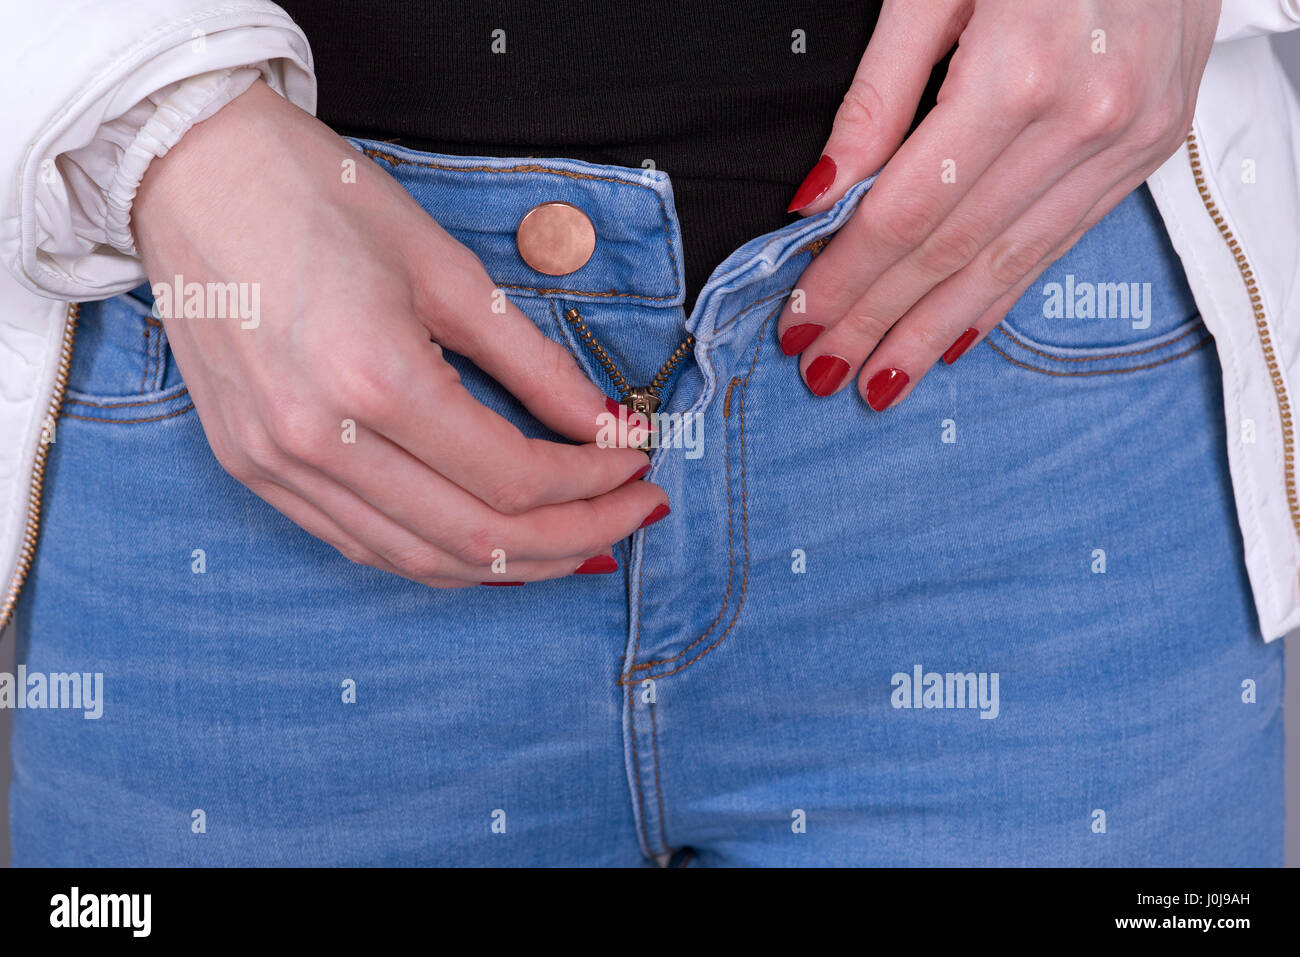 Mujer atravesando su blue jeans zip Imagen De Stock